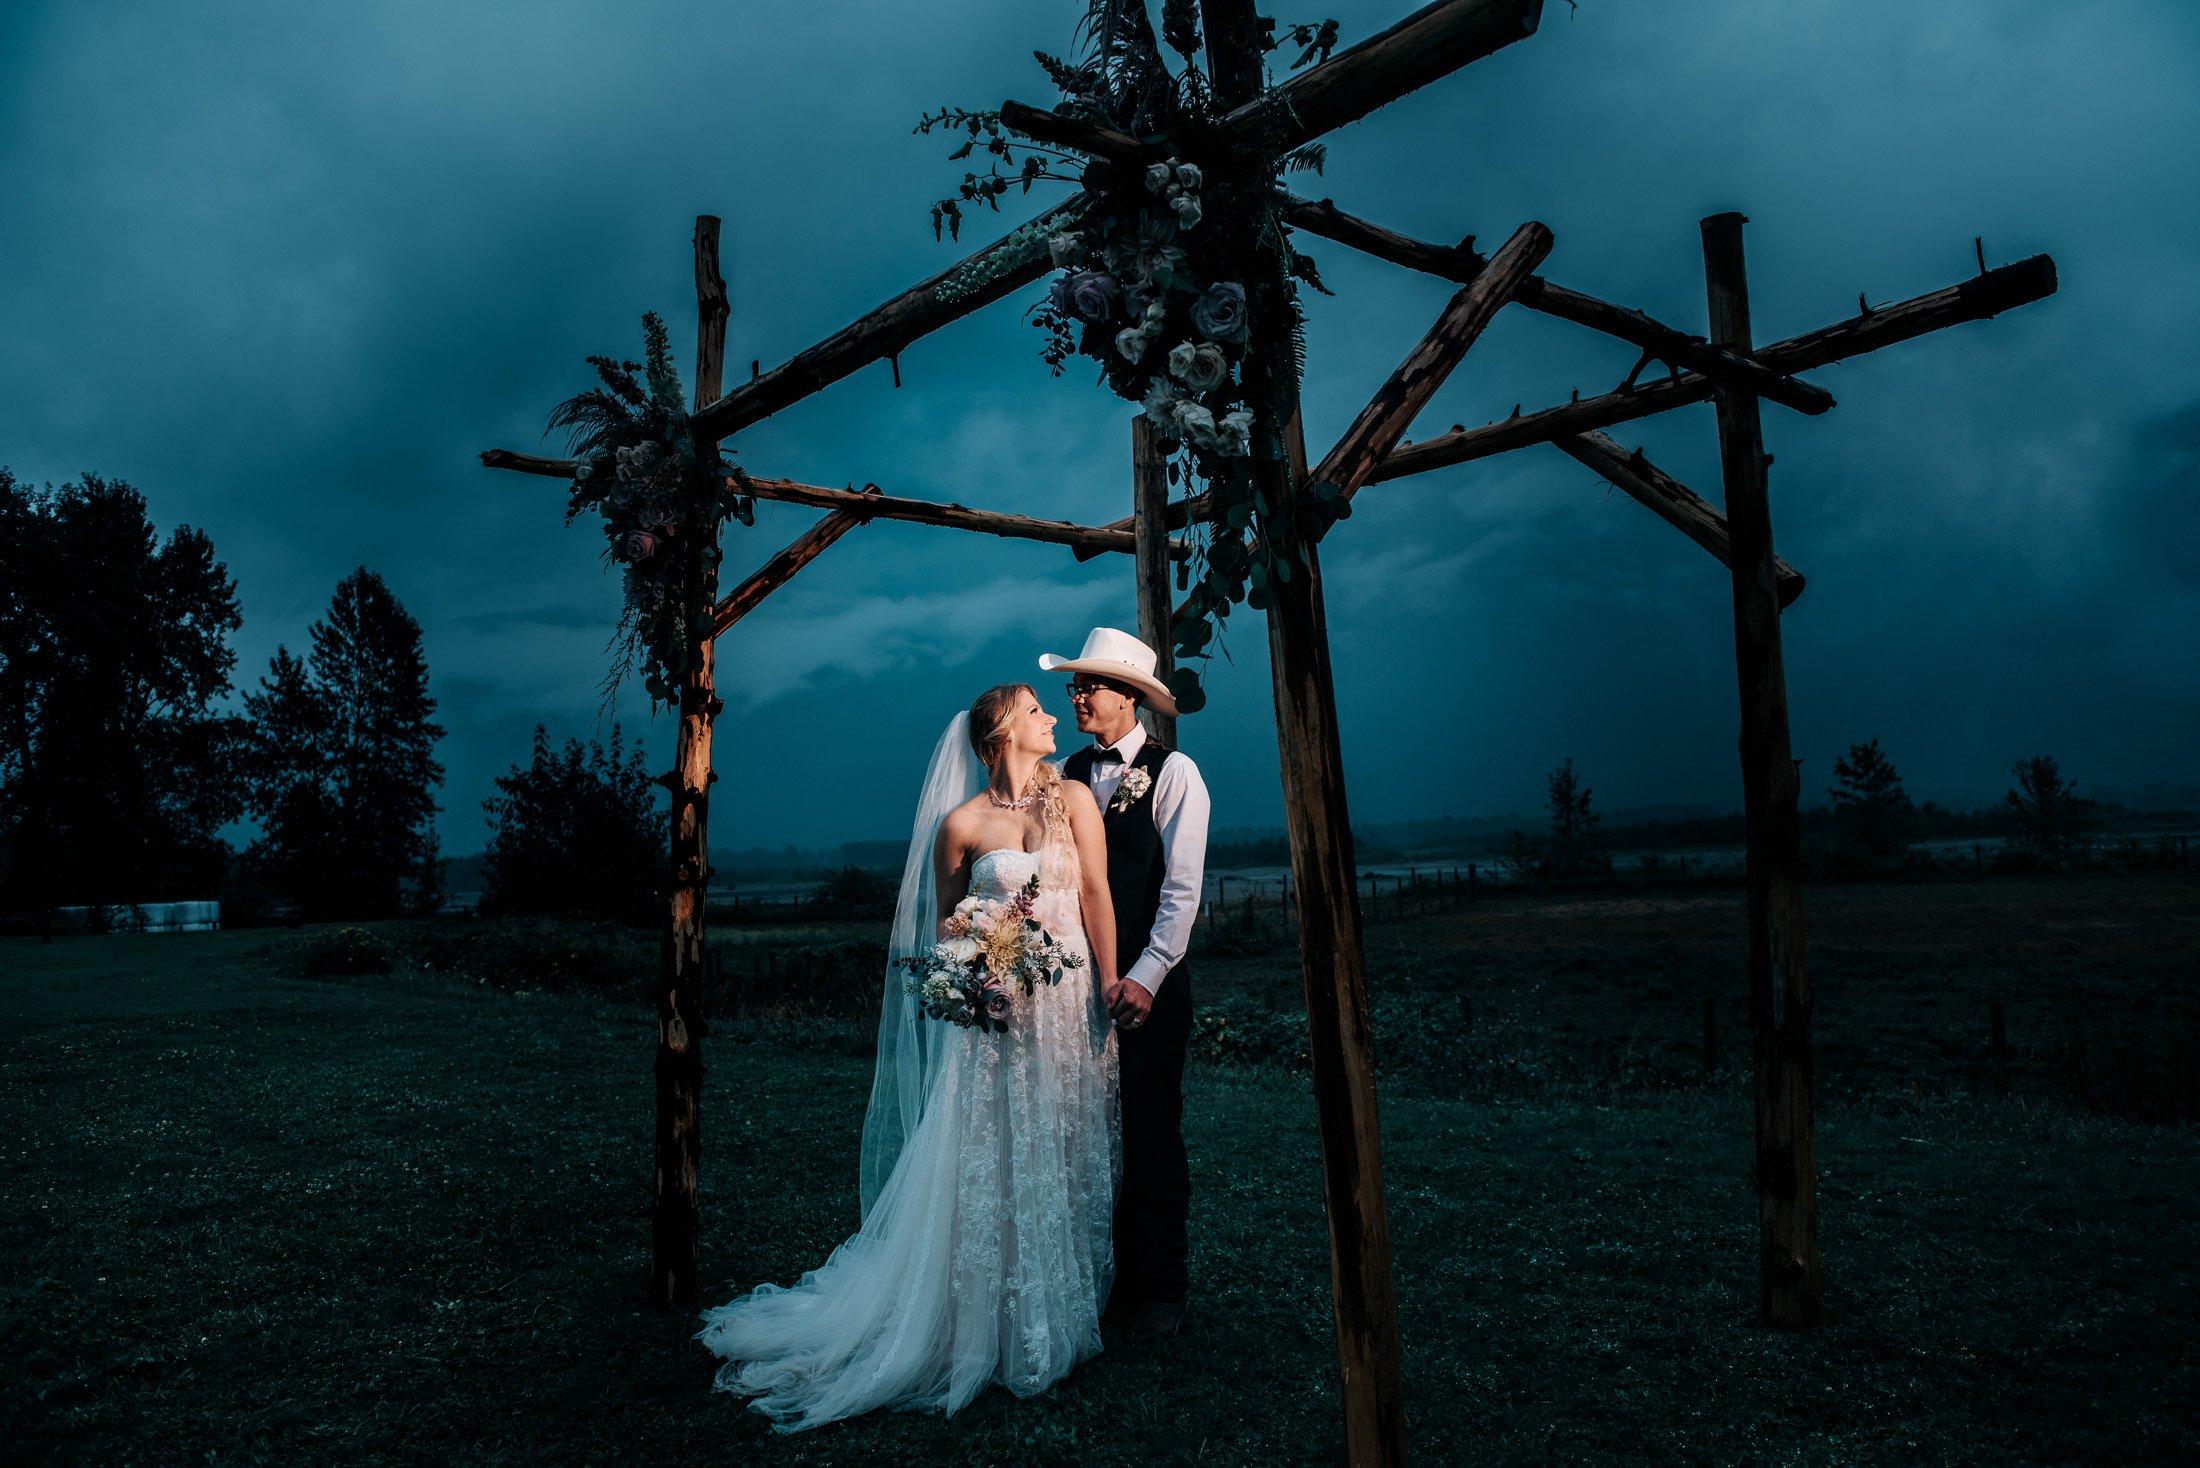 012 dramatic wedding photo fraser river